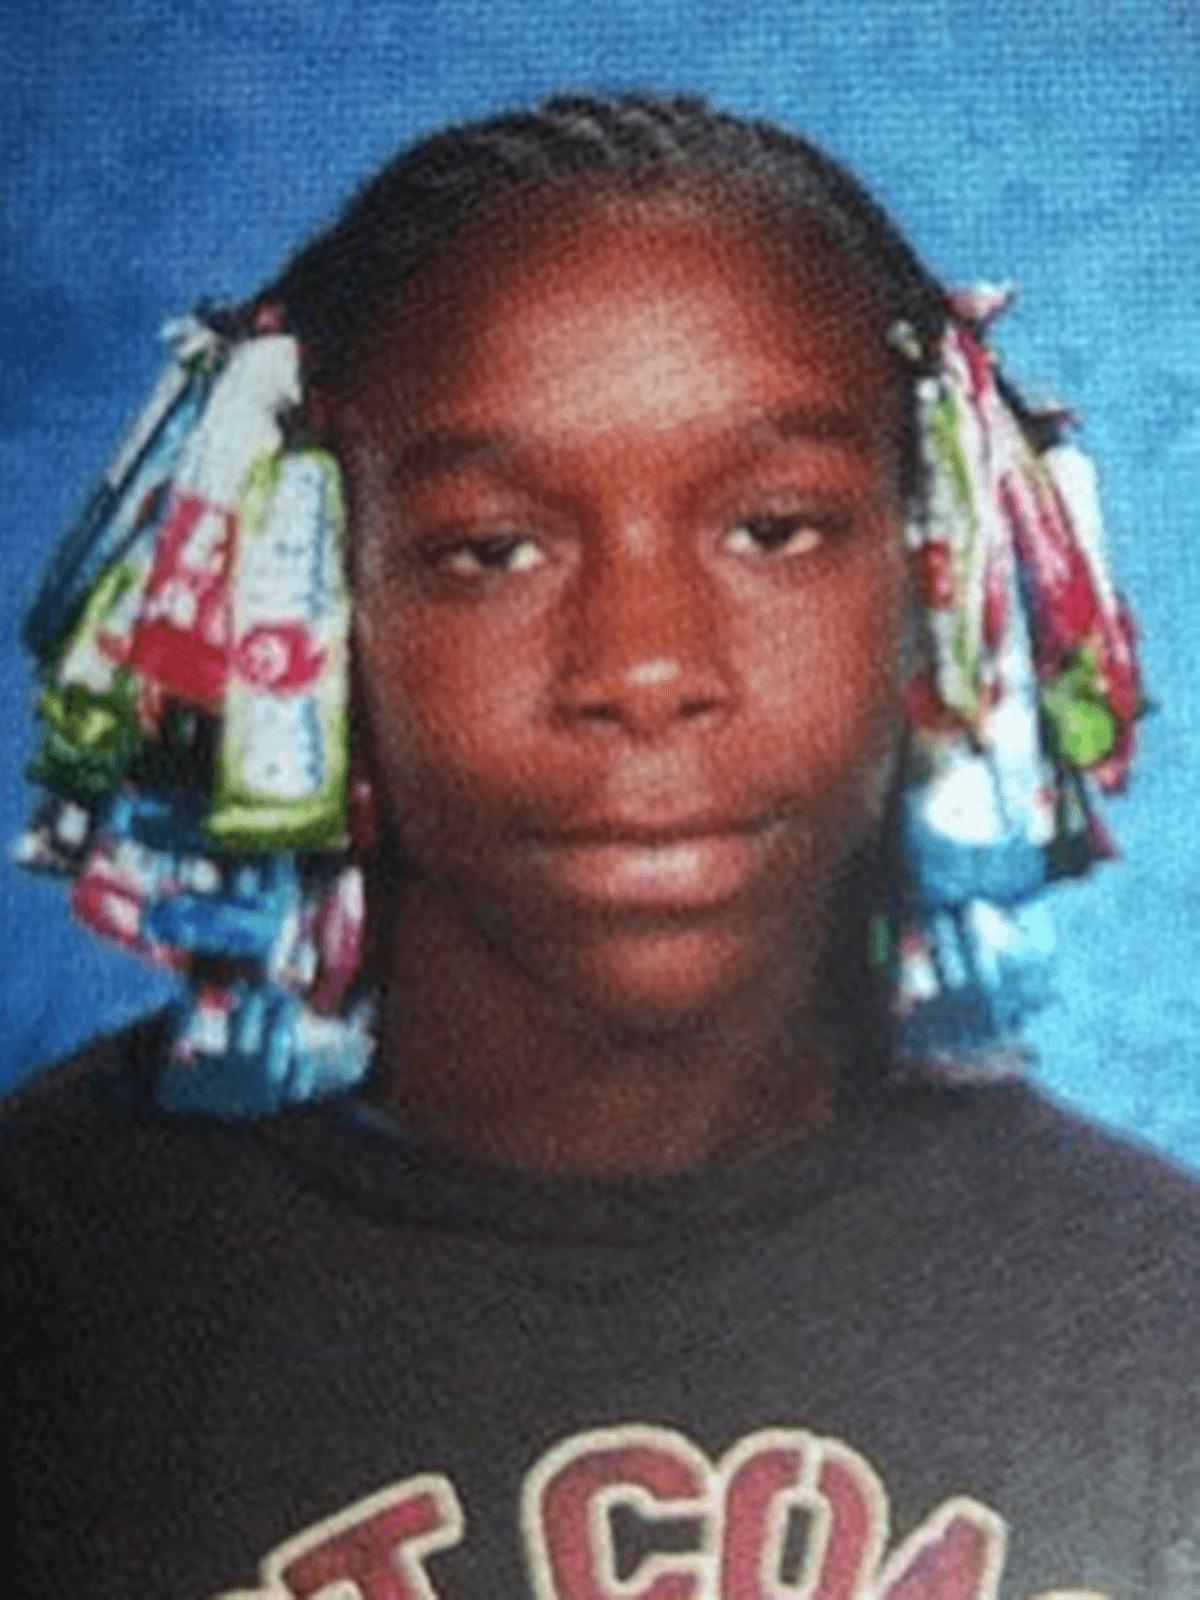 10 15 Hilariously Awkward Yearbook Photos